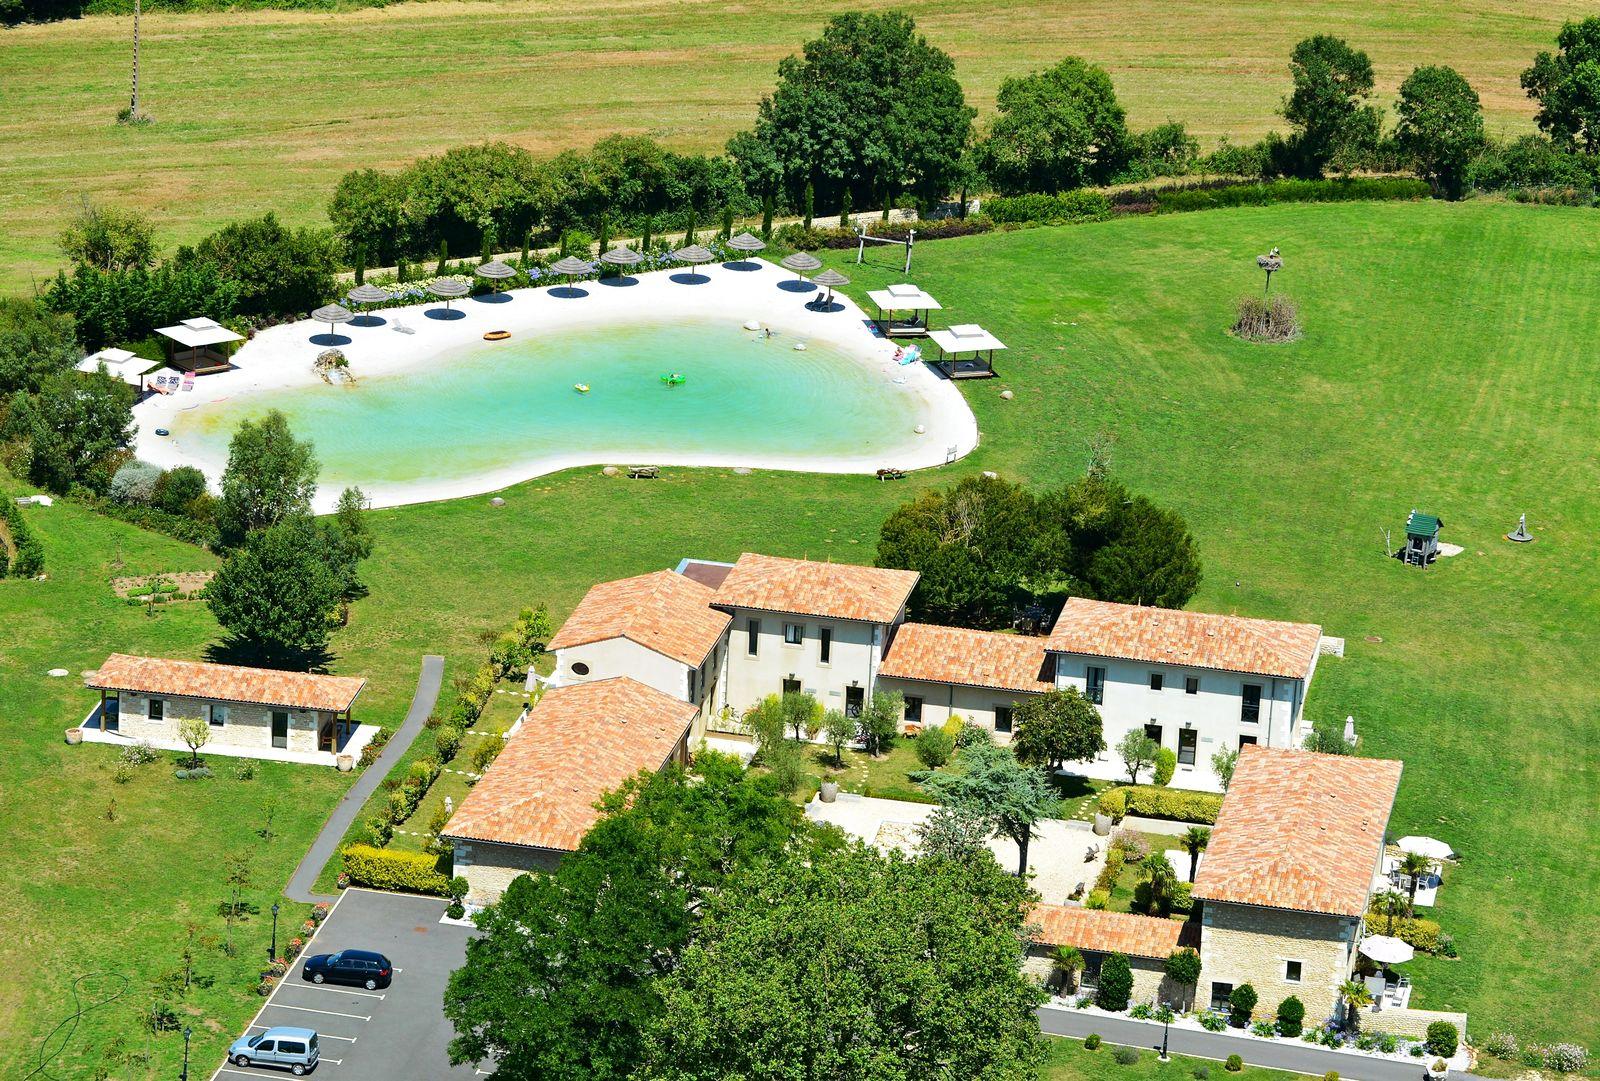 Afbeelding van Domaine les Marées - 3. l'Abri de Loutre vakantiehuis nabij strand in Frankrijk